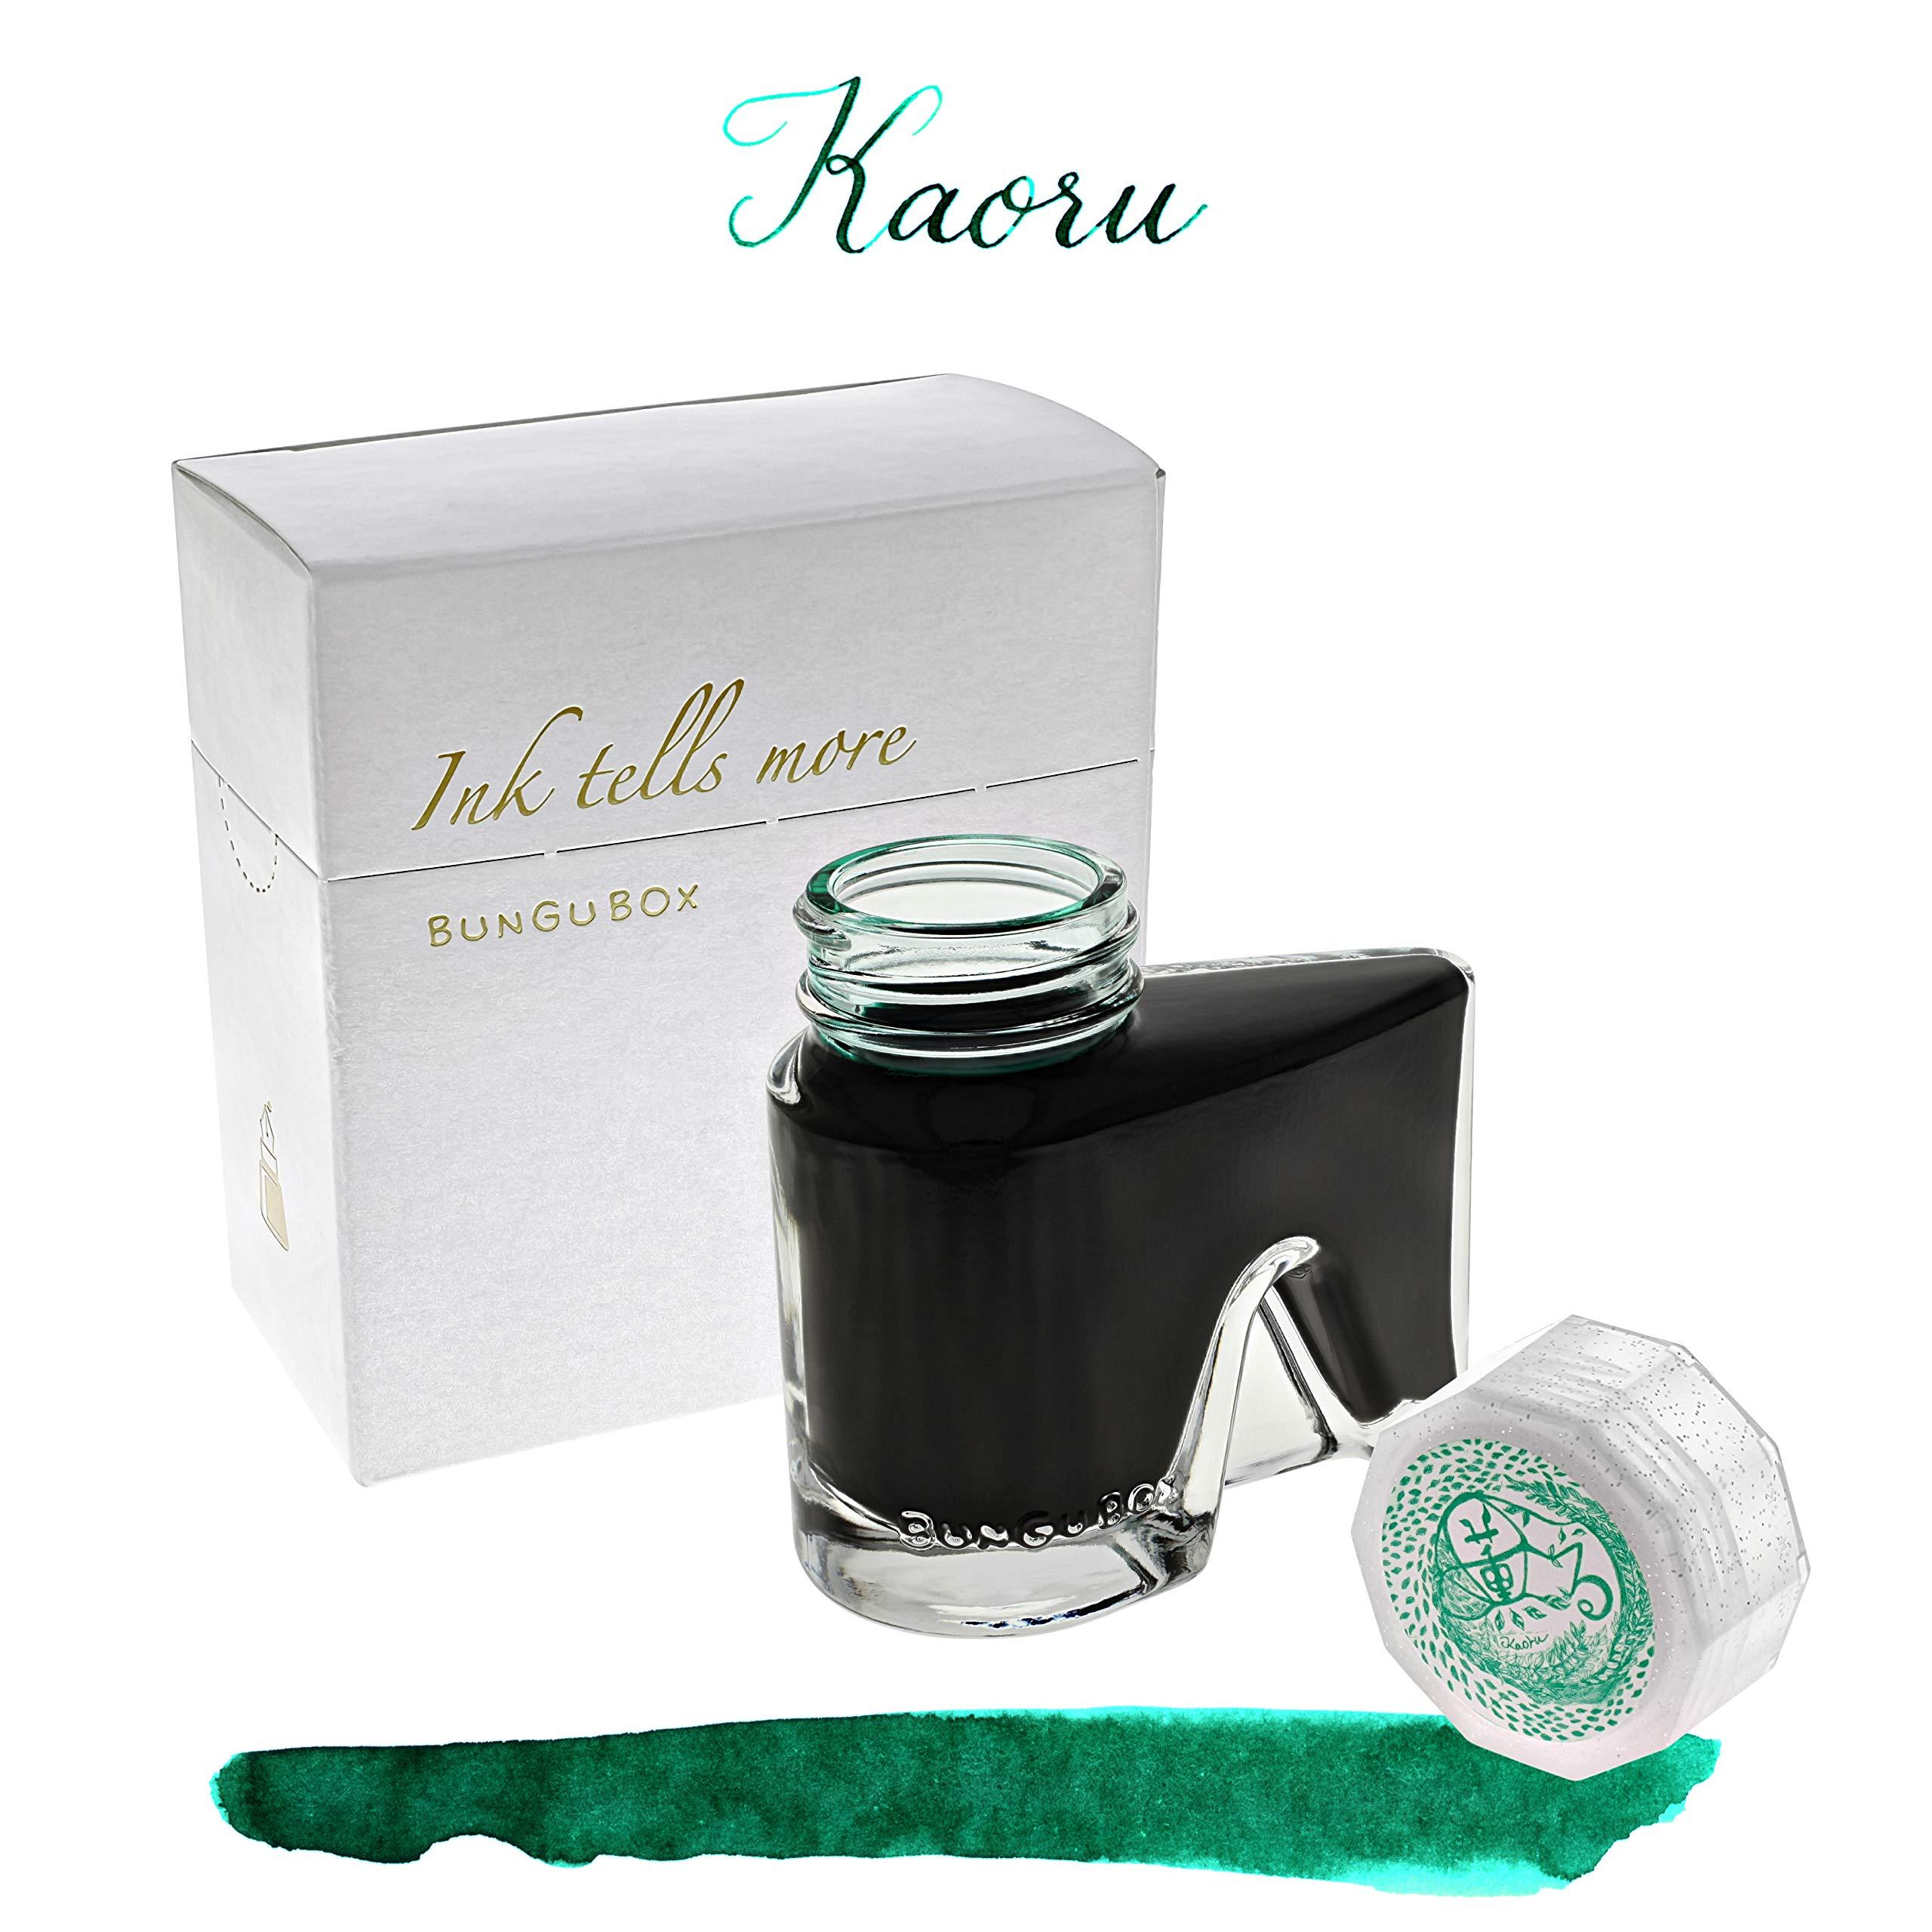 Bungubox 30mL Bottled Ink in Kaoru by Bungubox (Image #1)